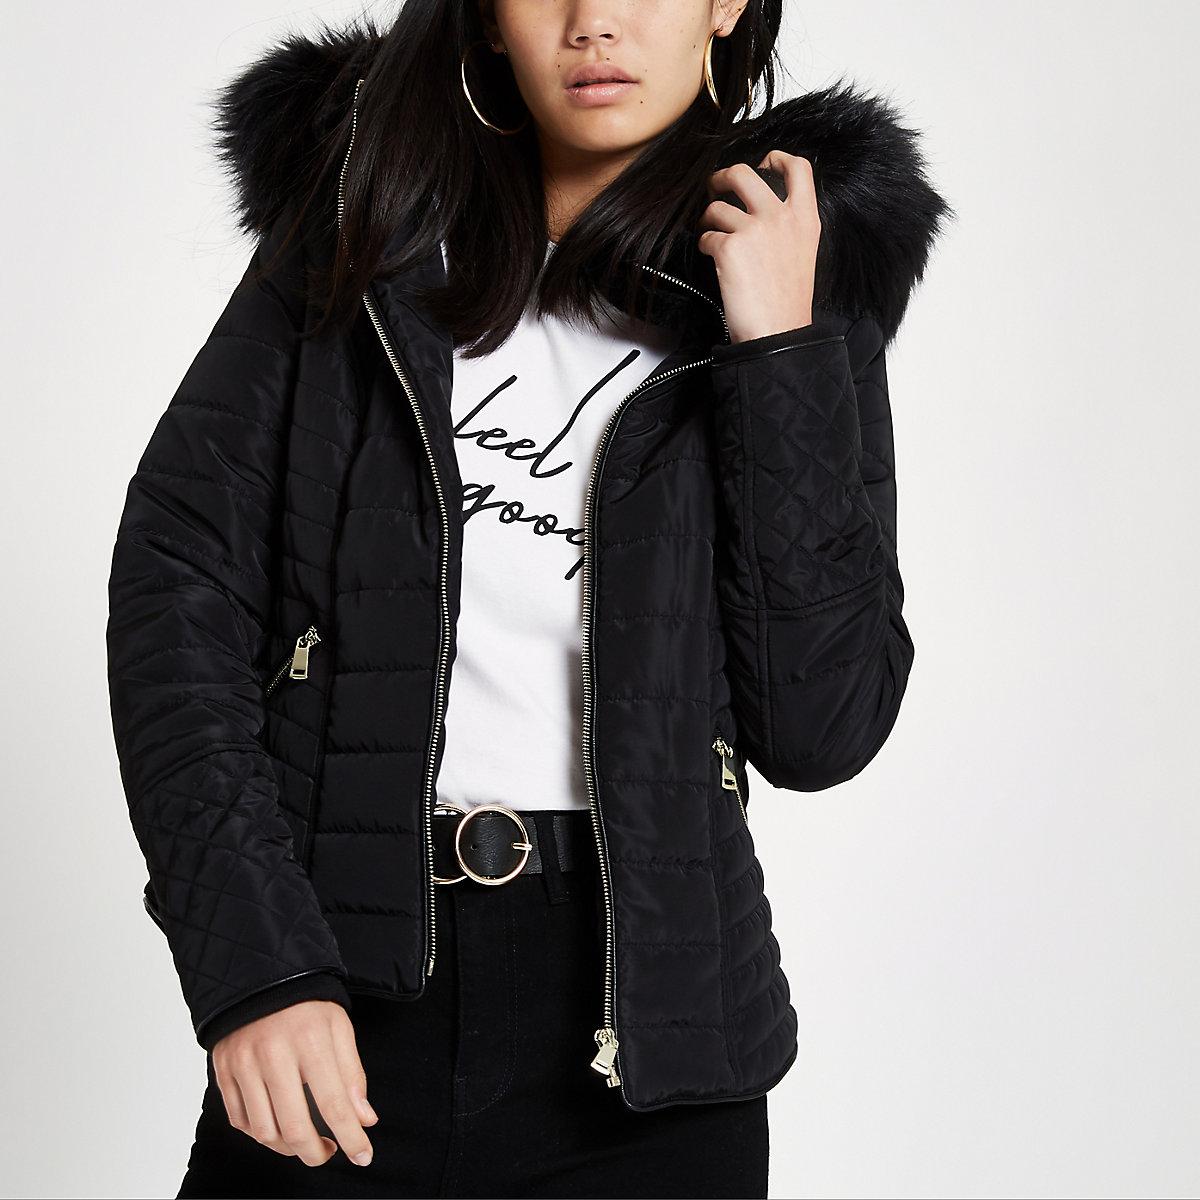 0077b3f8233 Black faux fur hood long sleeve padded jacket - Jackets - Coats   Jackets -  women